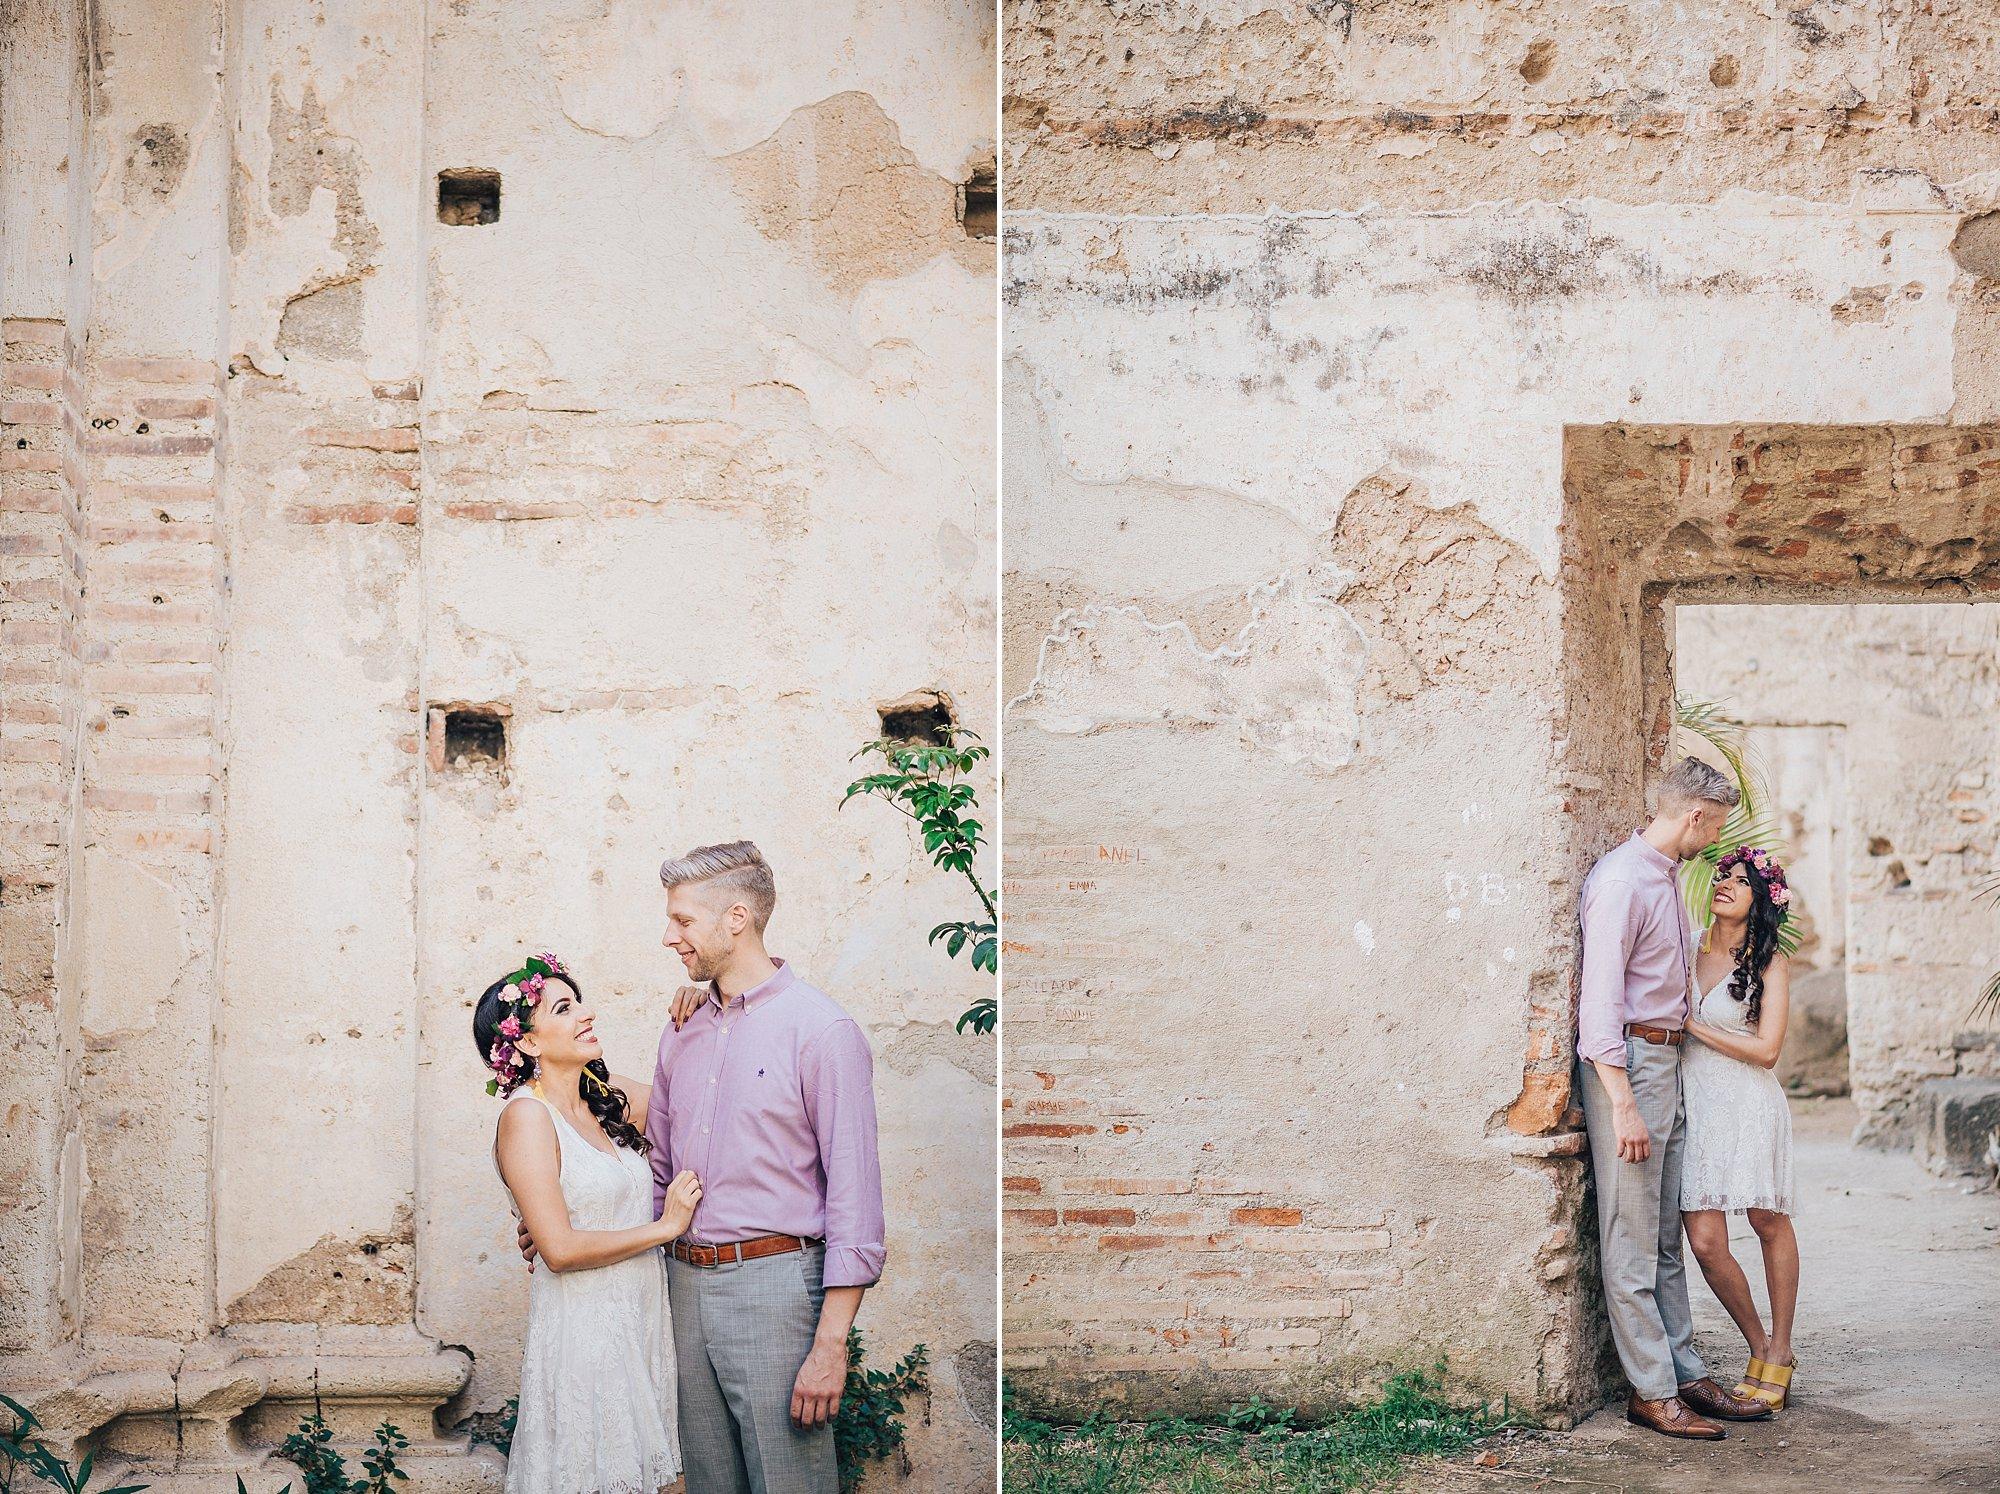 alex-yazmin-wedding-photographer-antigua-guatemala-002